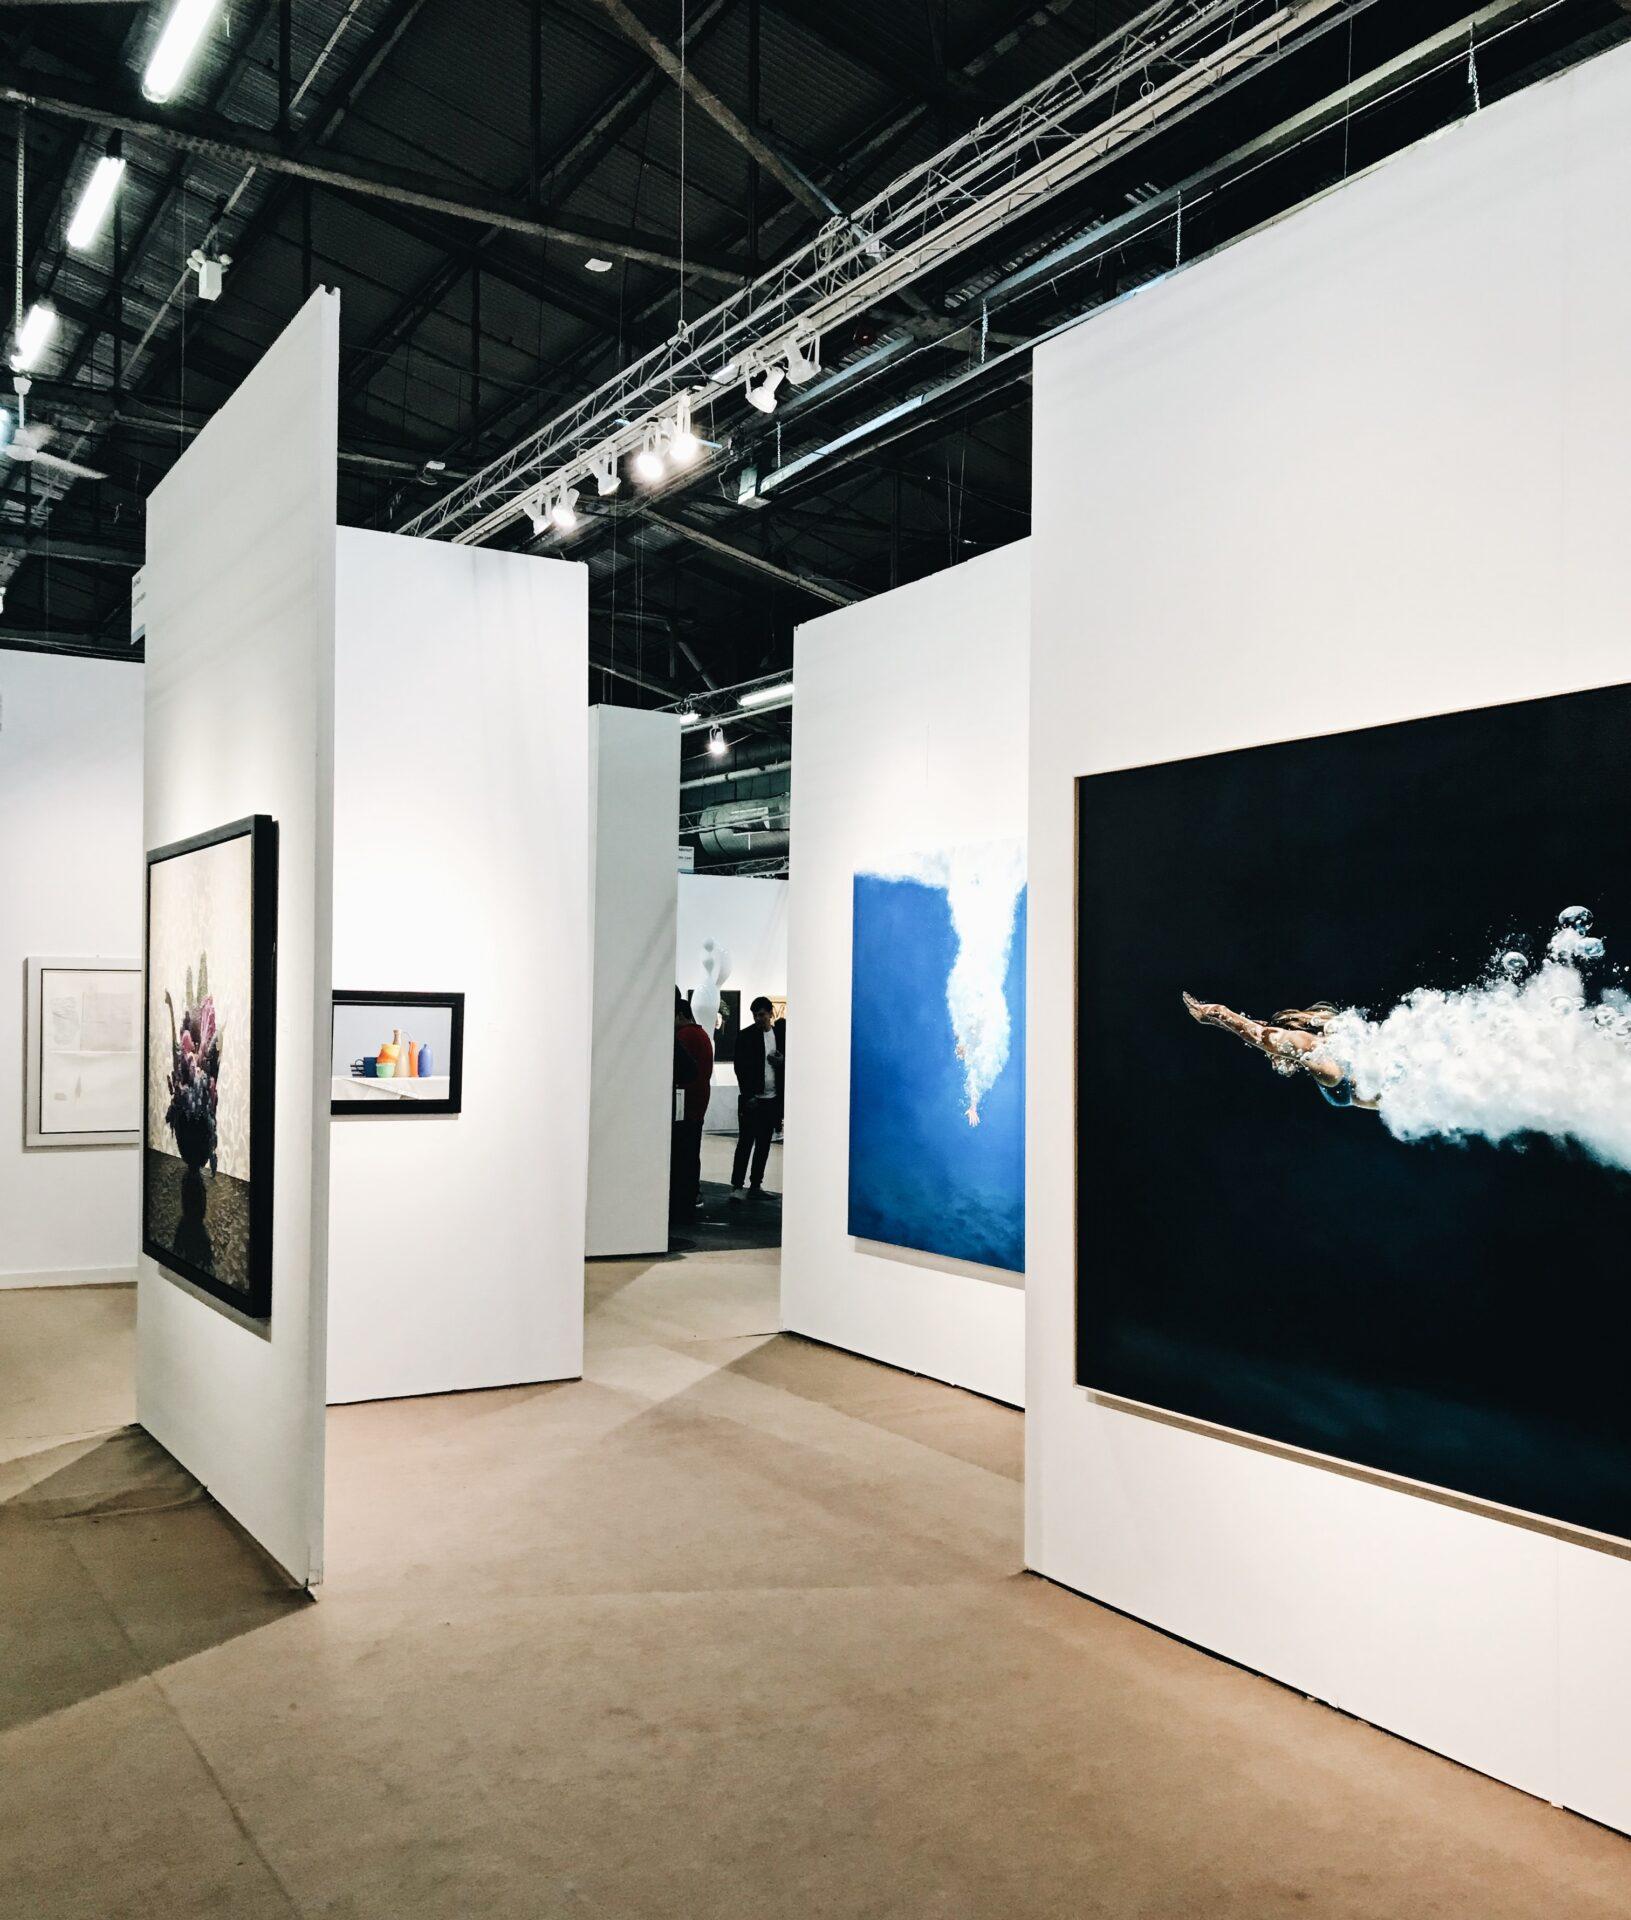 events-space-art-gallery-paintings-artwork